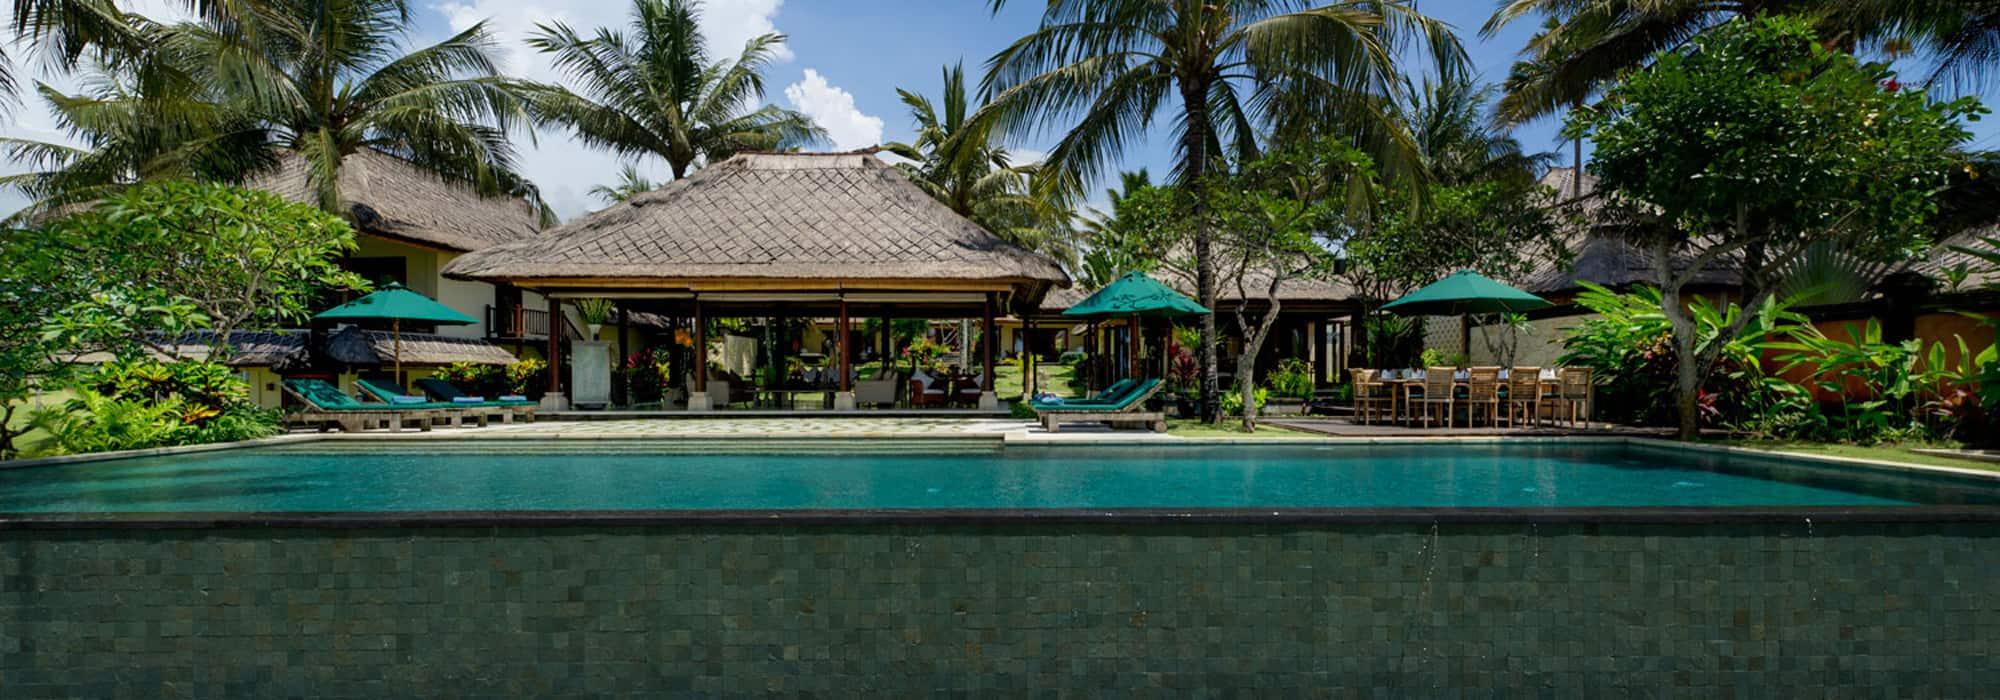 6 Bedroom Cemagi Luxury Villa